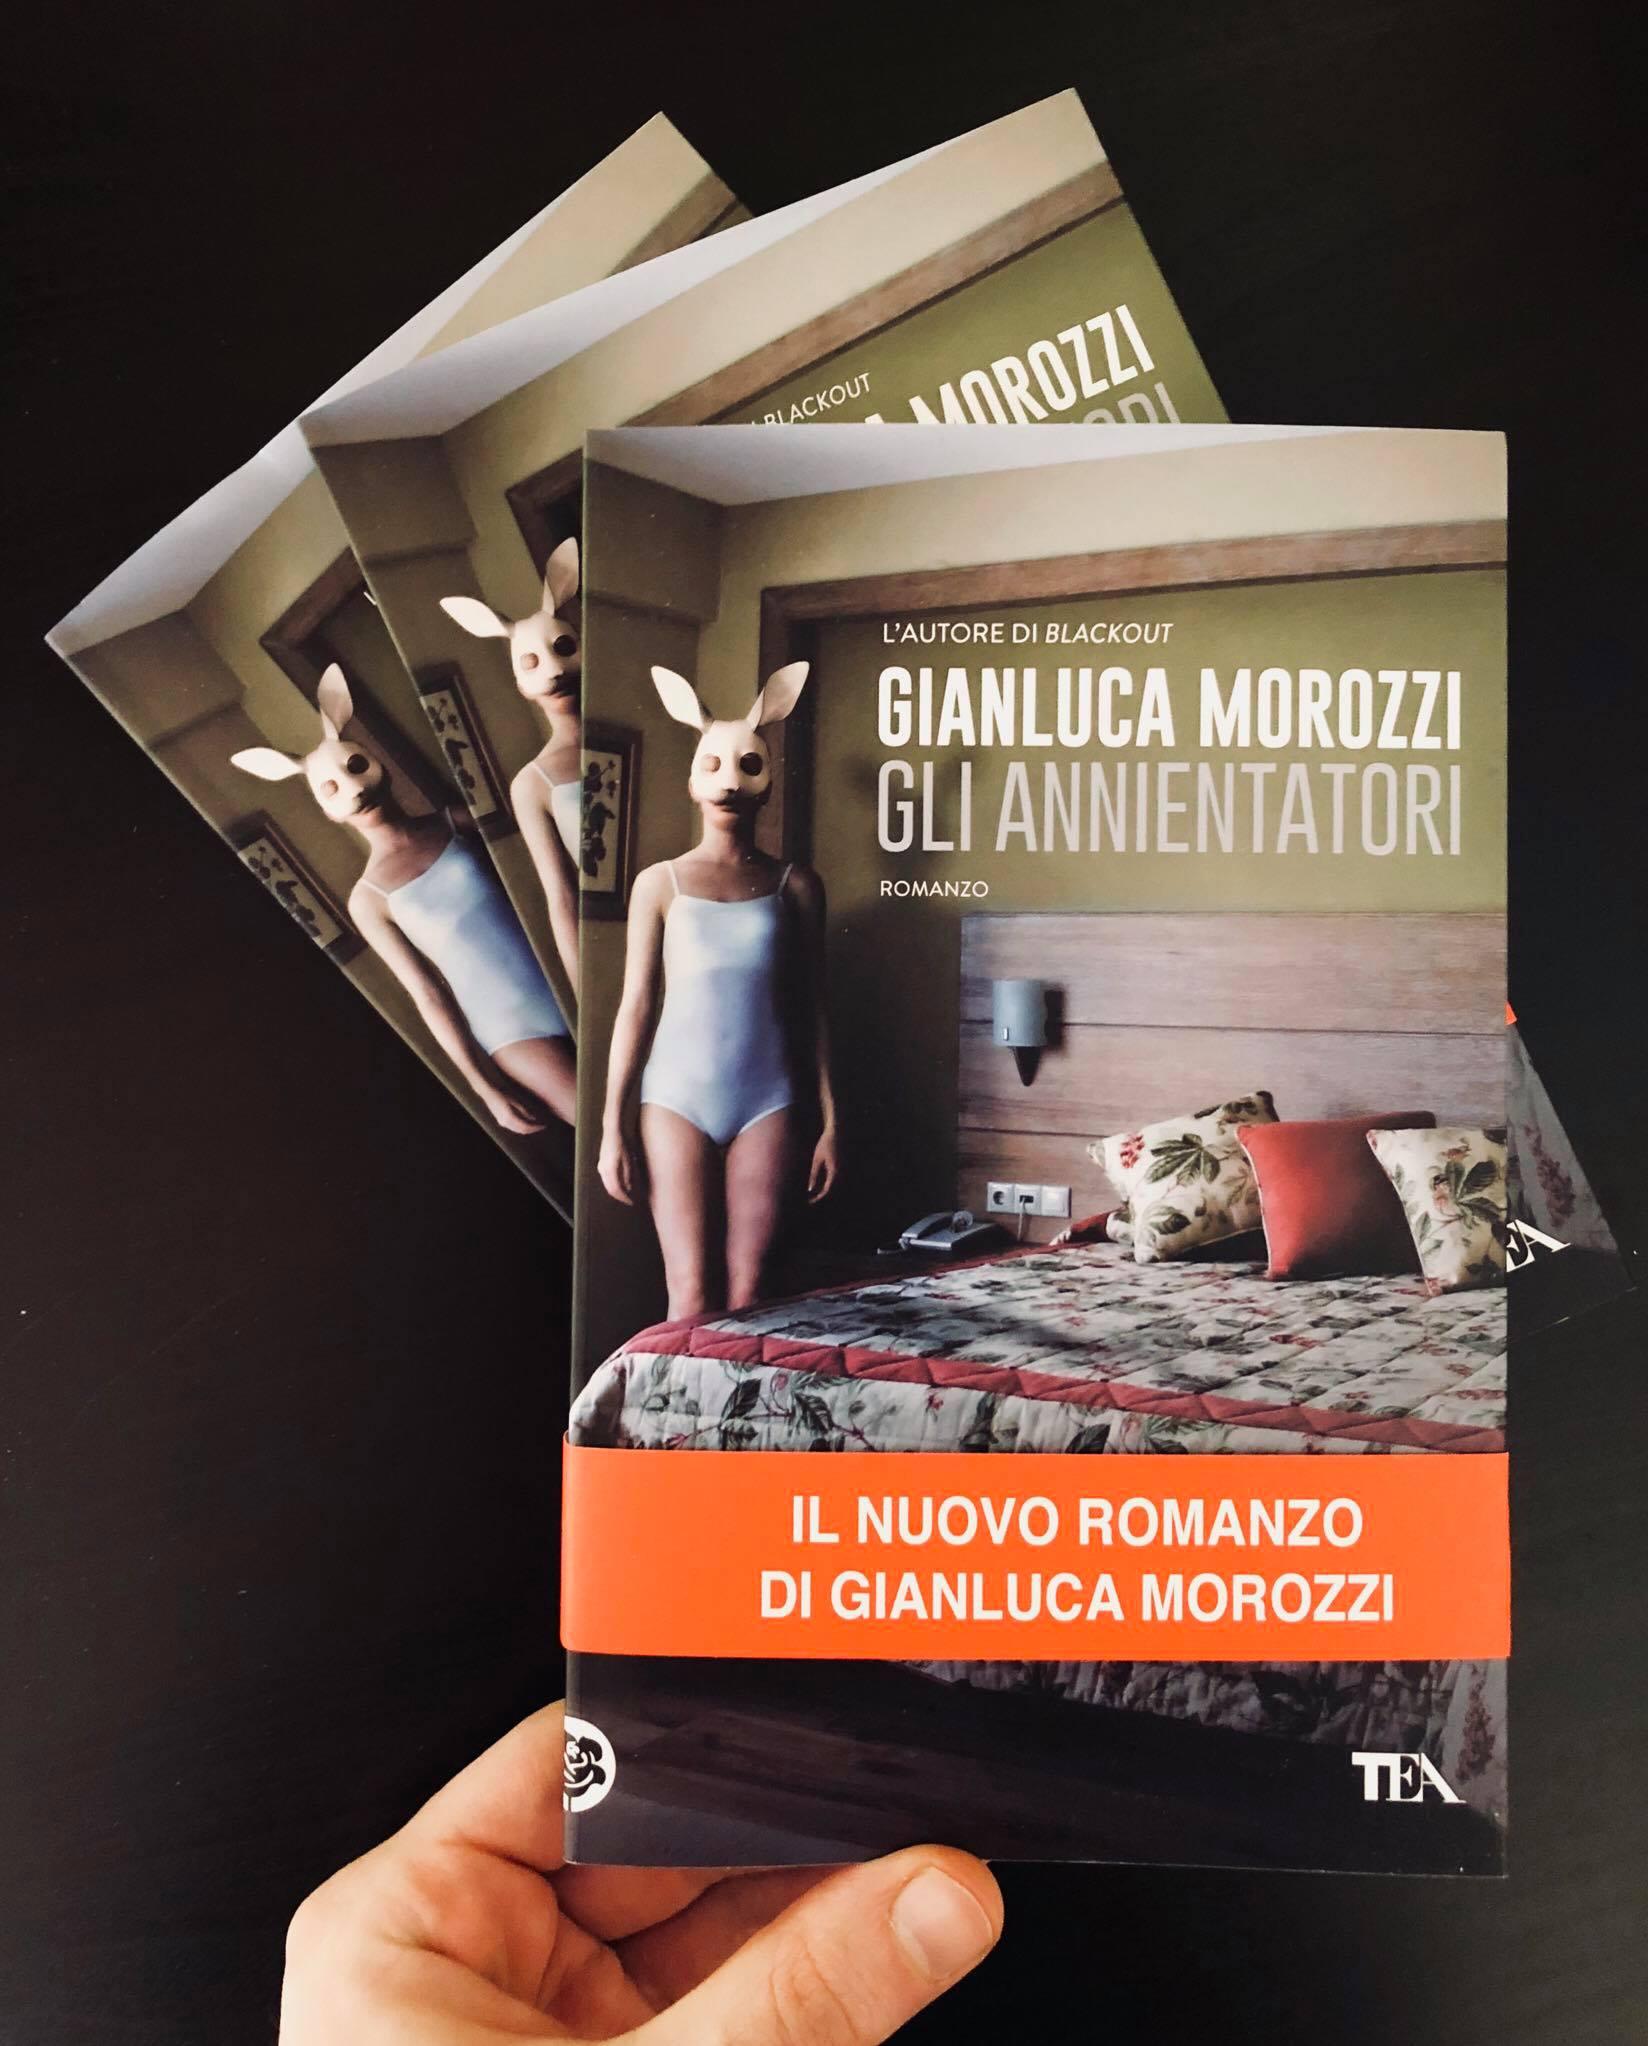 Gli Annientatori - Gianluca Morozzi